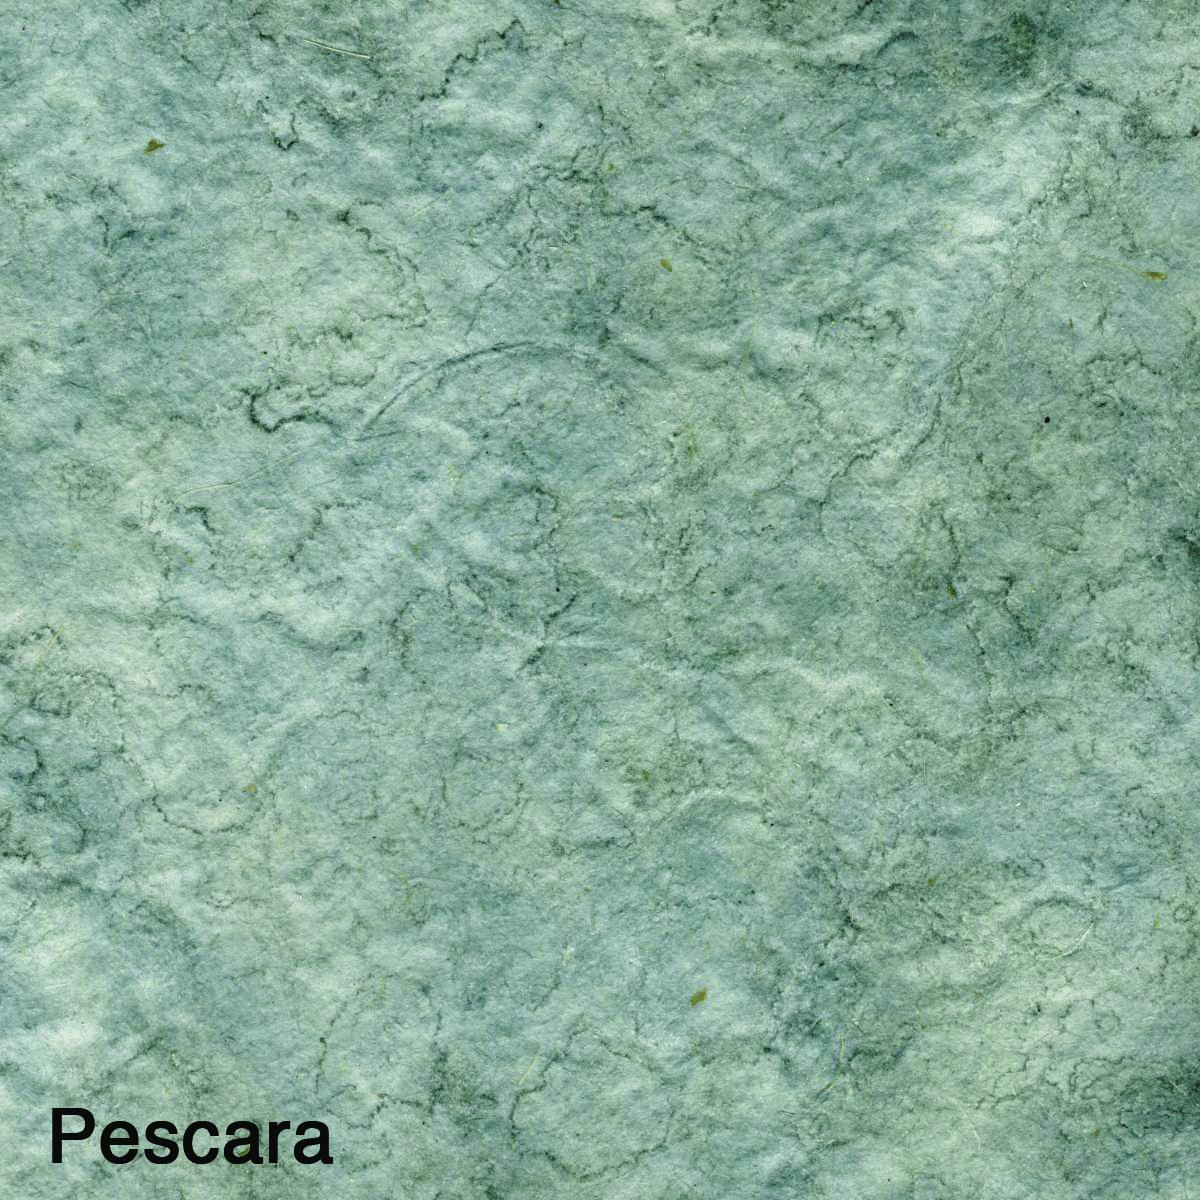 Pescara006.jpg